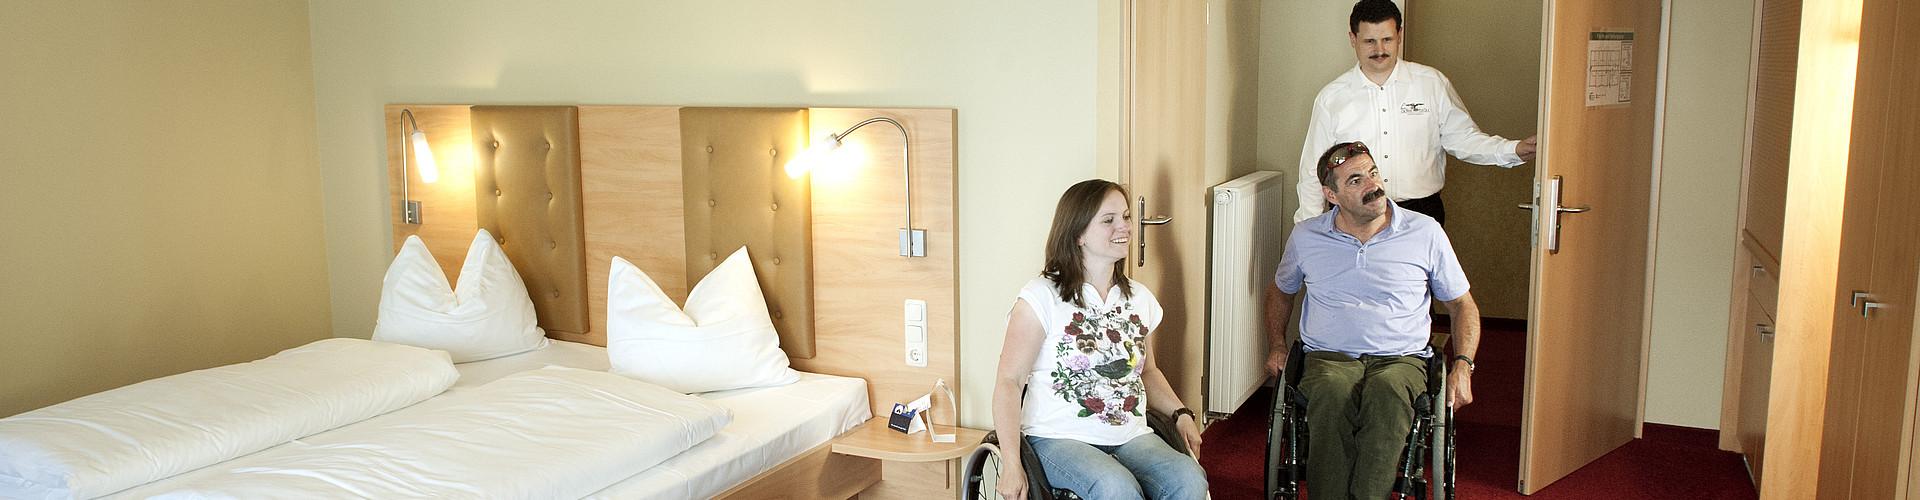 Hotel Adlerbräu Doppelzimmer